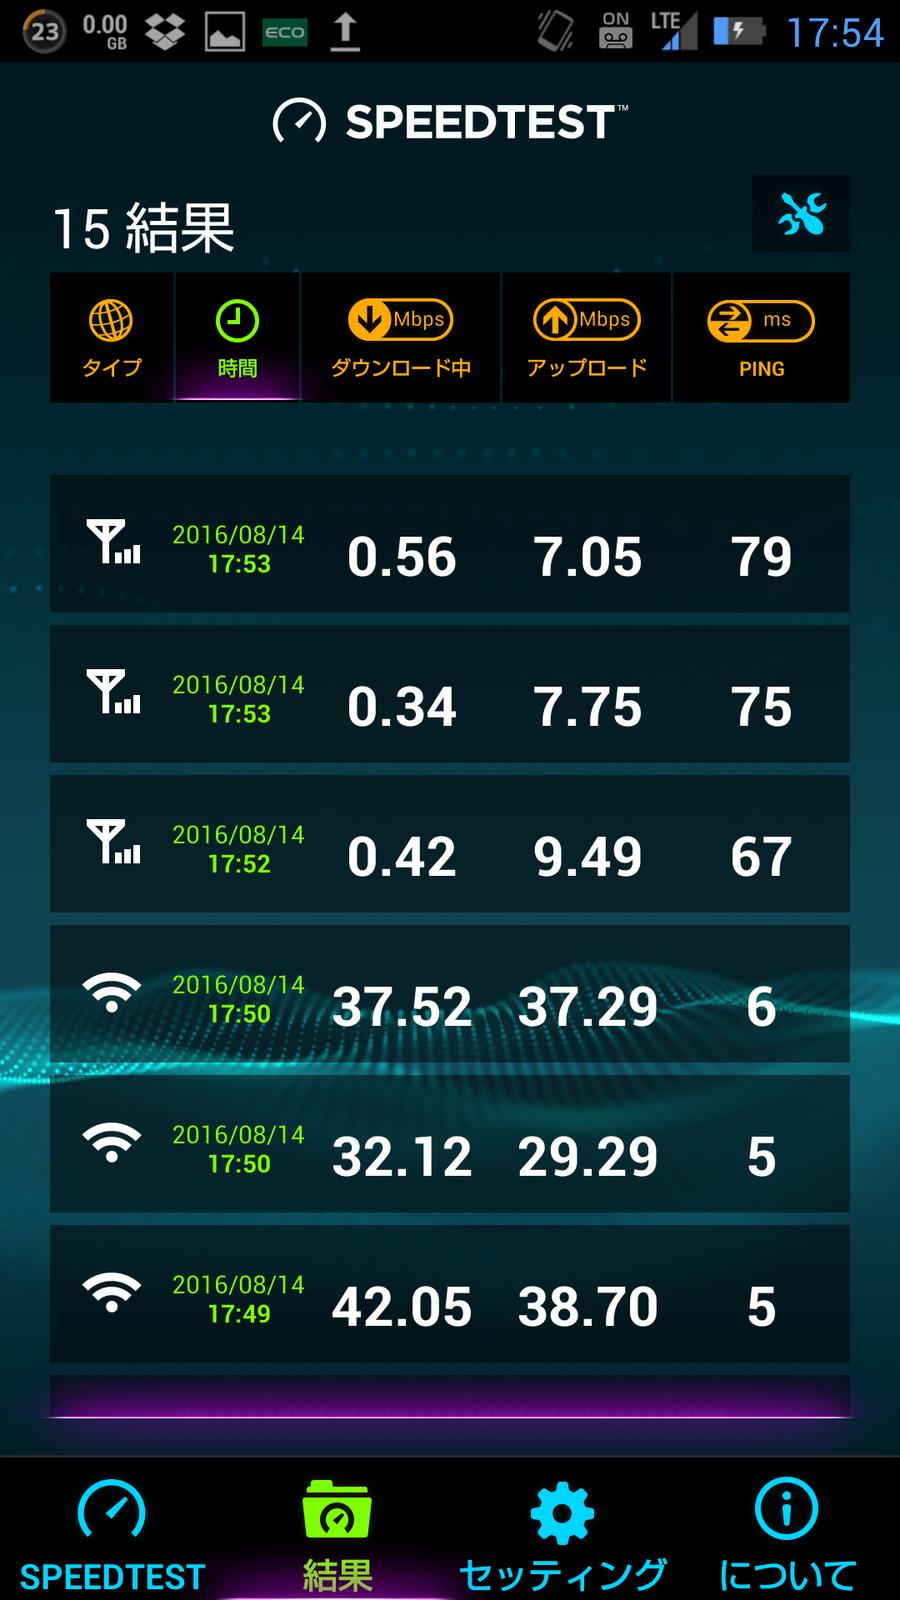 0_sim_speedtestnet_2